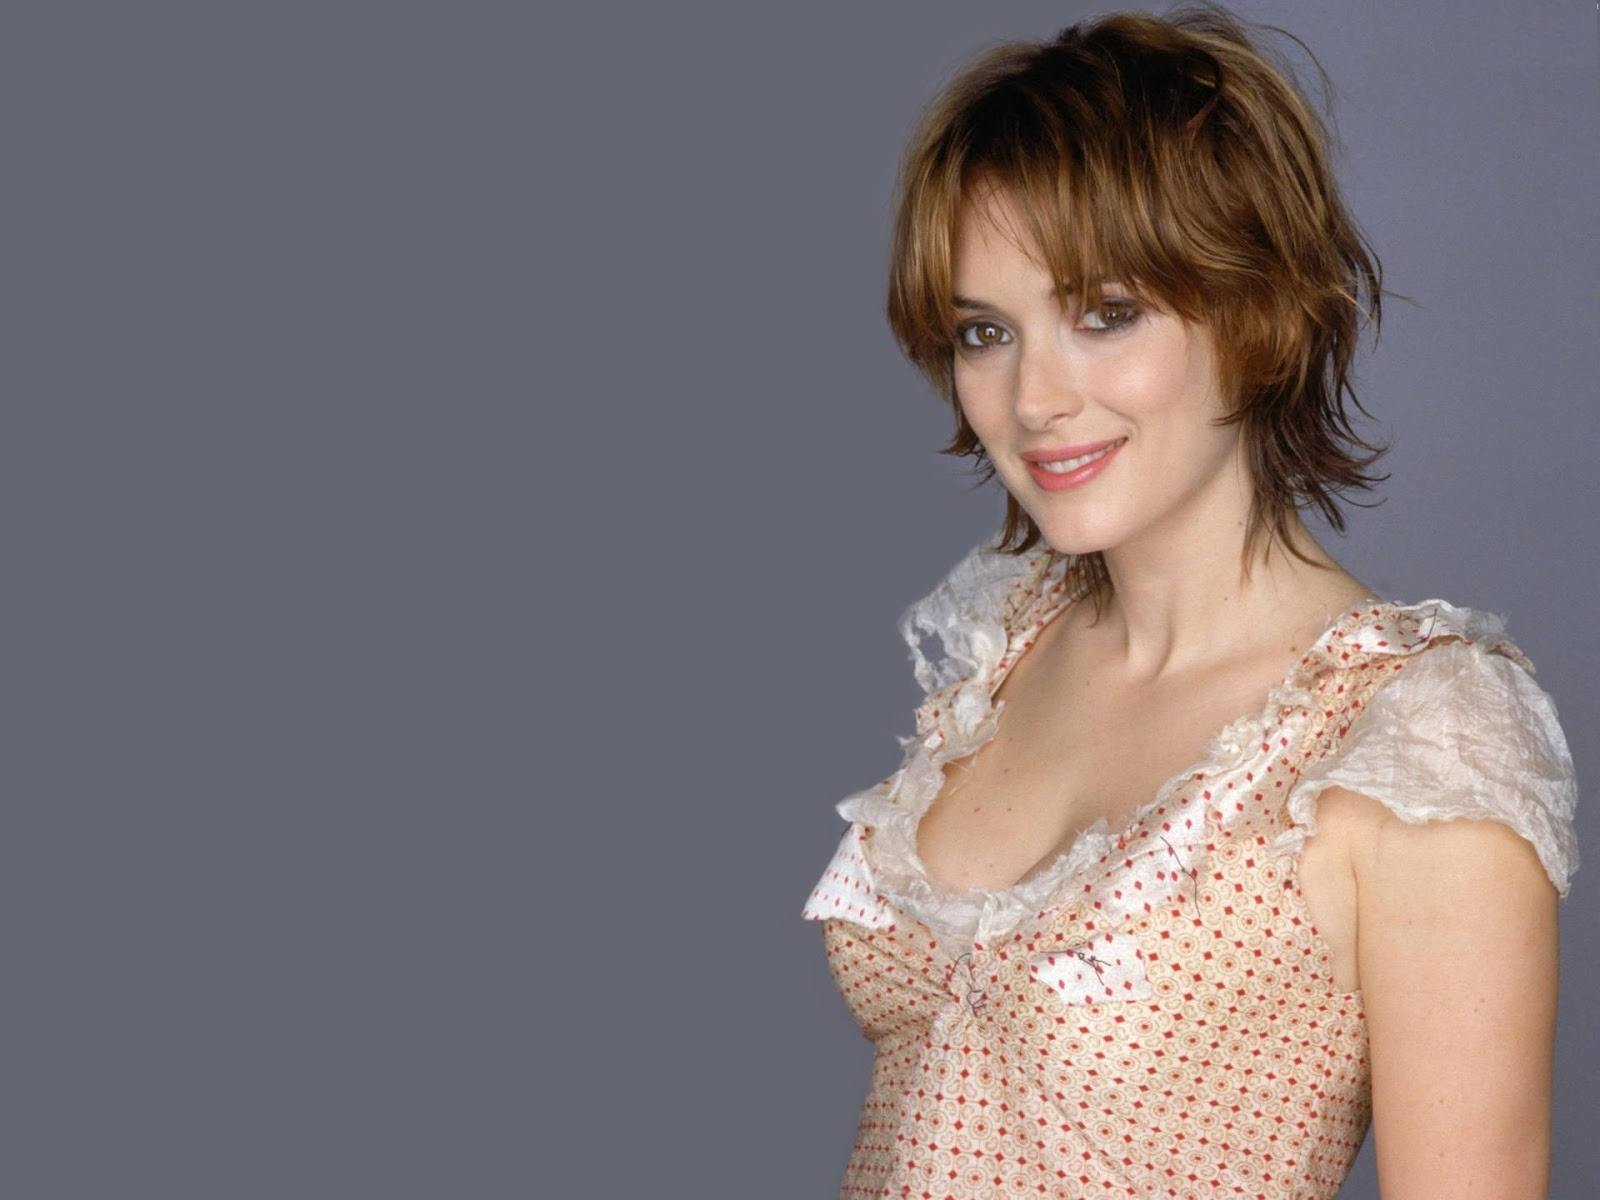 Joy Corrigan Photos,Vogue italy Adult clips Claudia romani sexy topless 27 Photos gif,CelebGate Anastasiya Ivleeva